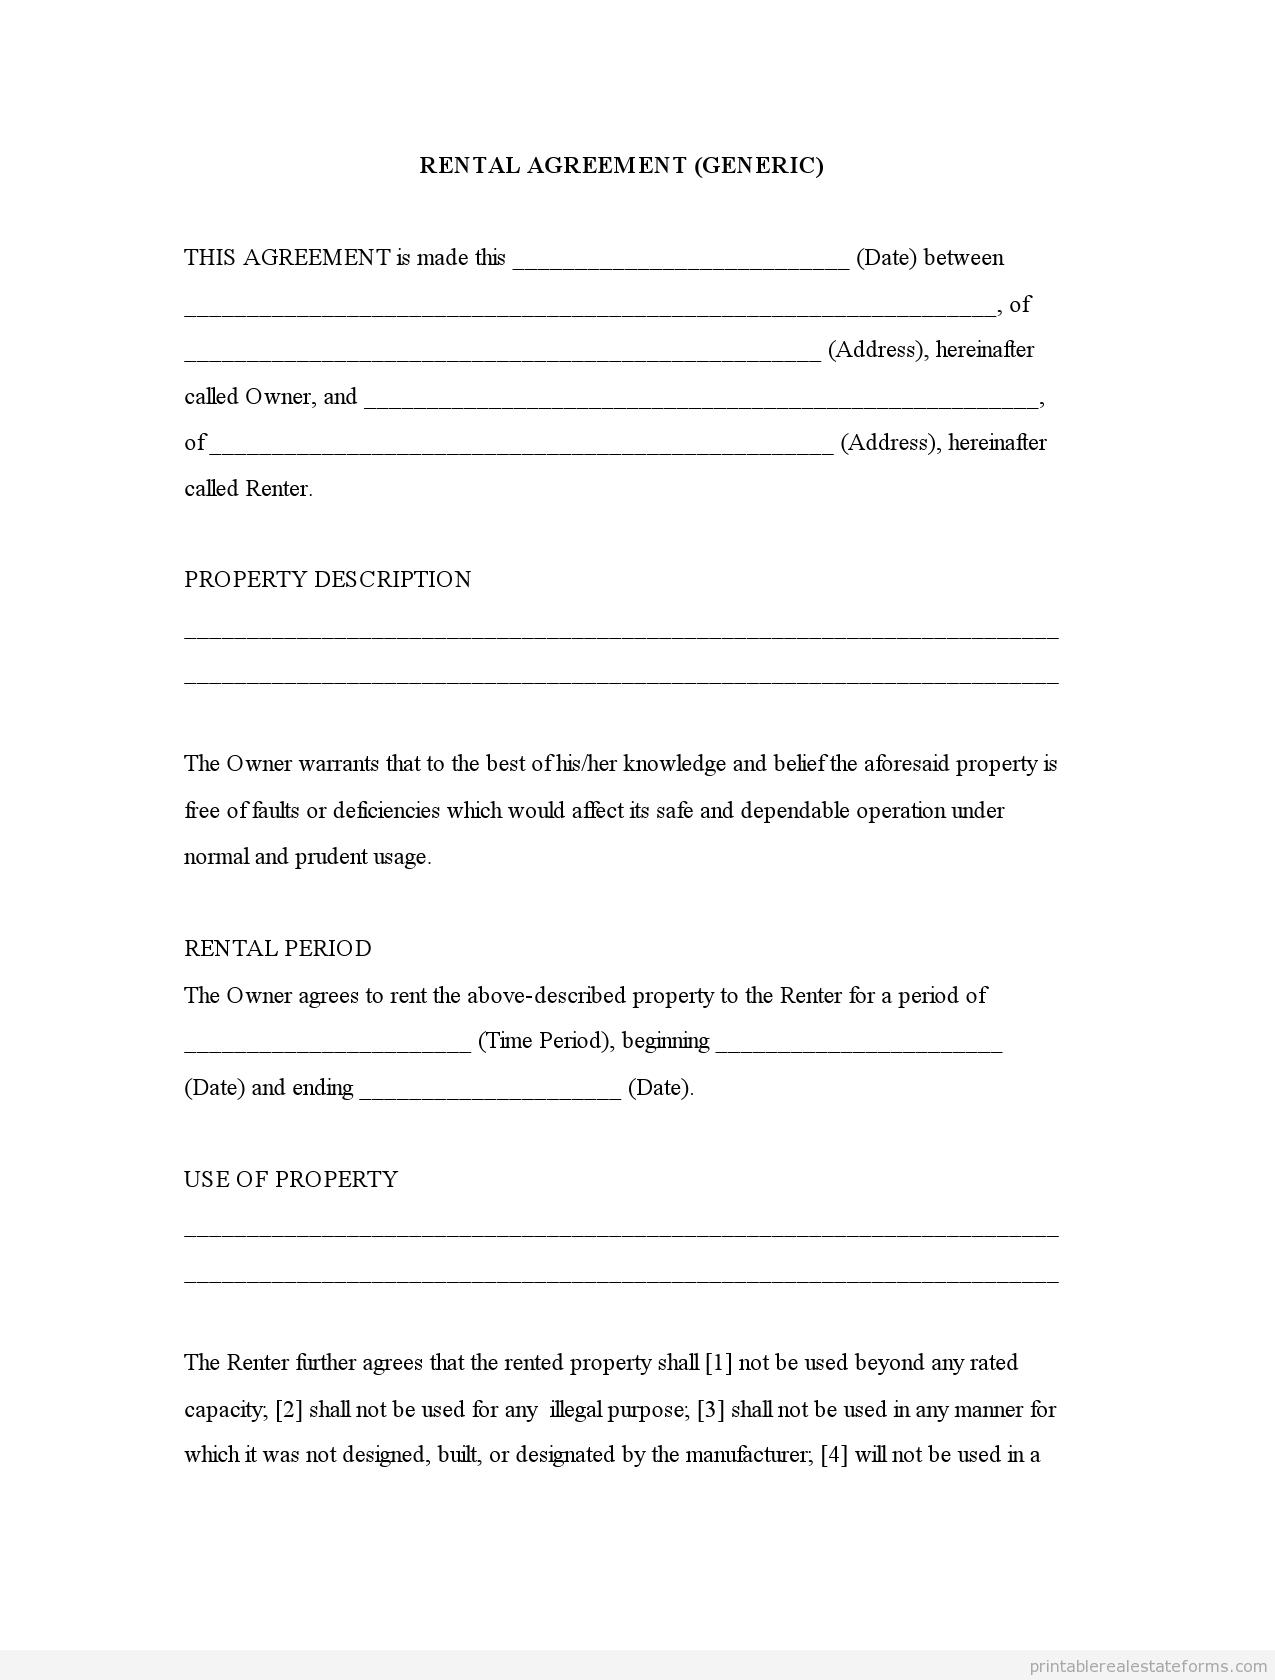 Free Printable Rental Agreement   Rental Agreement (Generic)0001 - Free Printable Rental Application Form